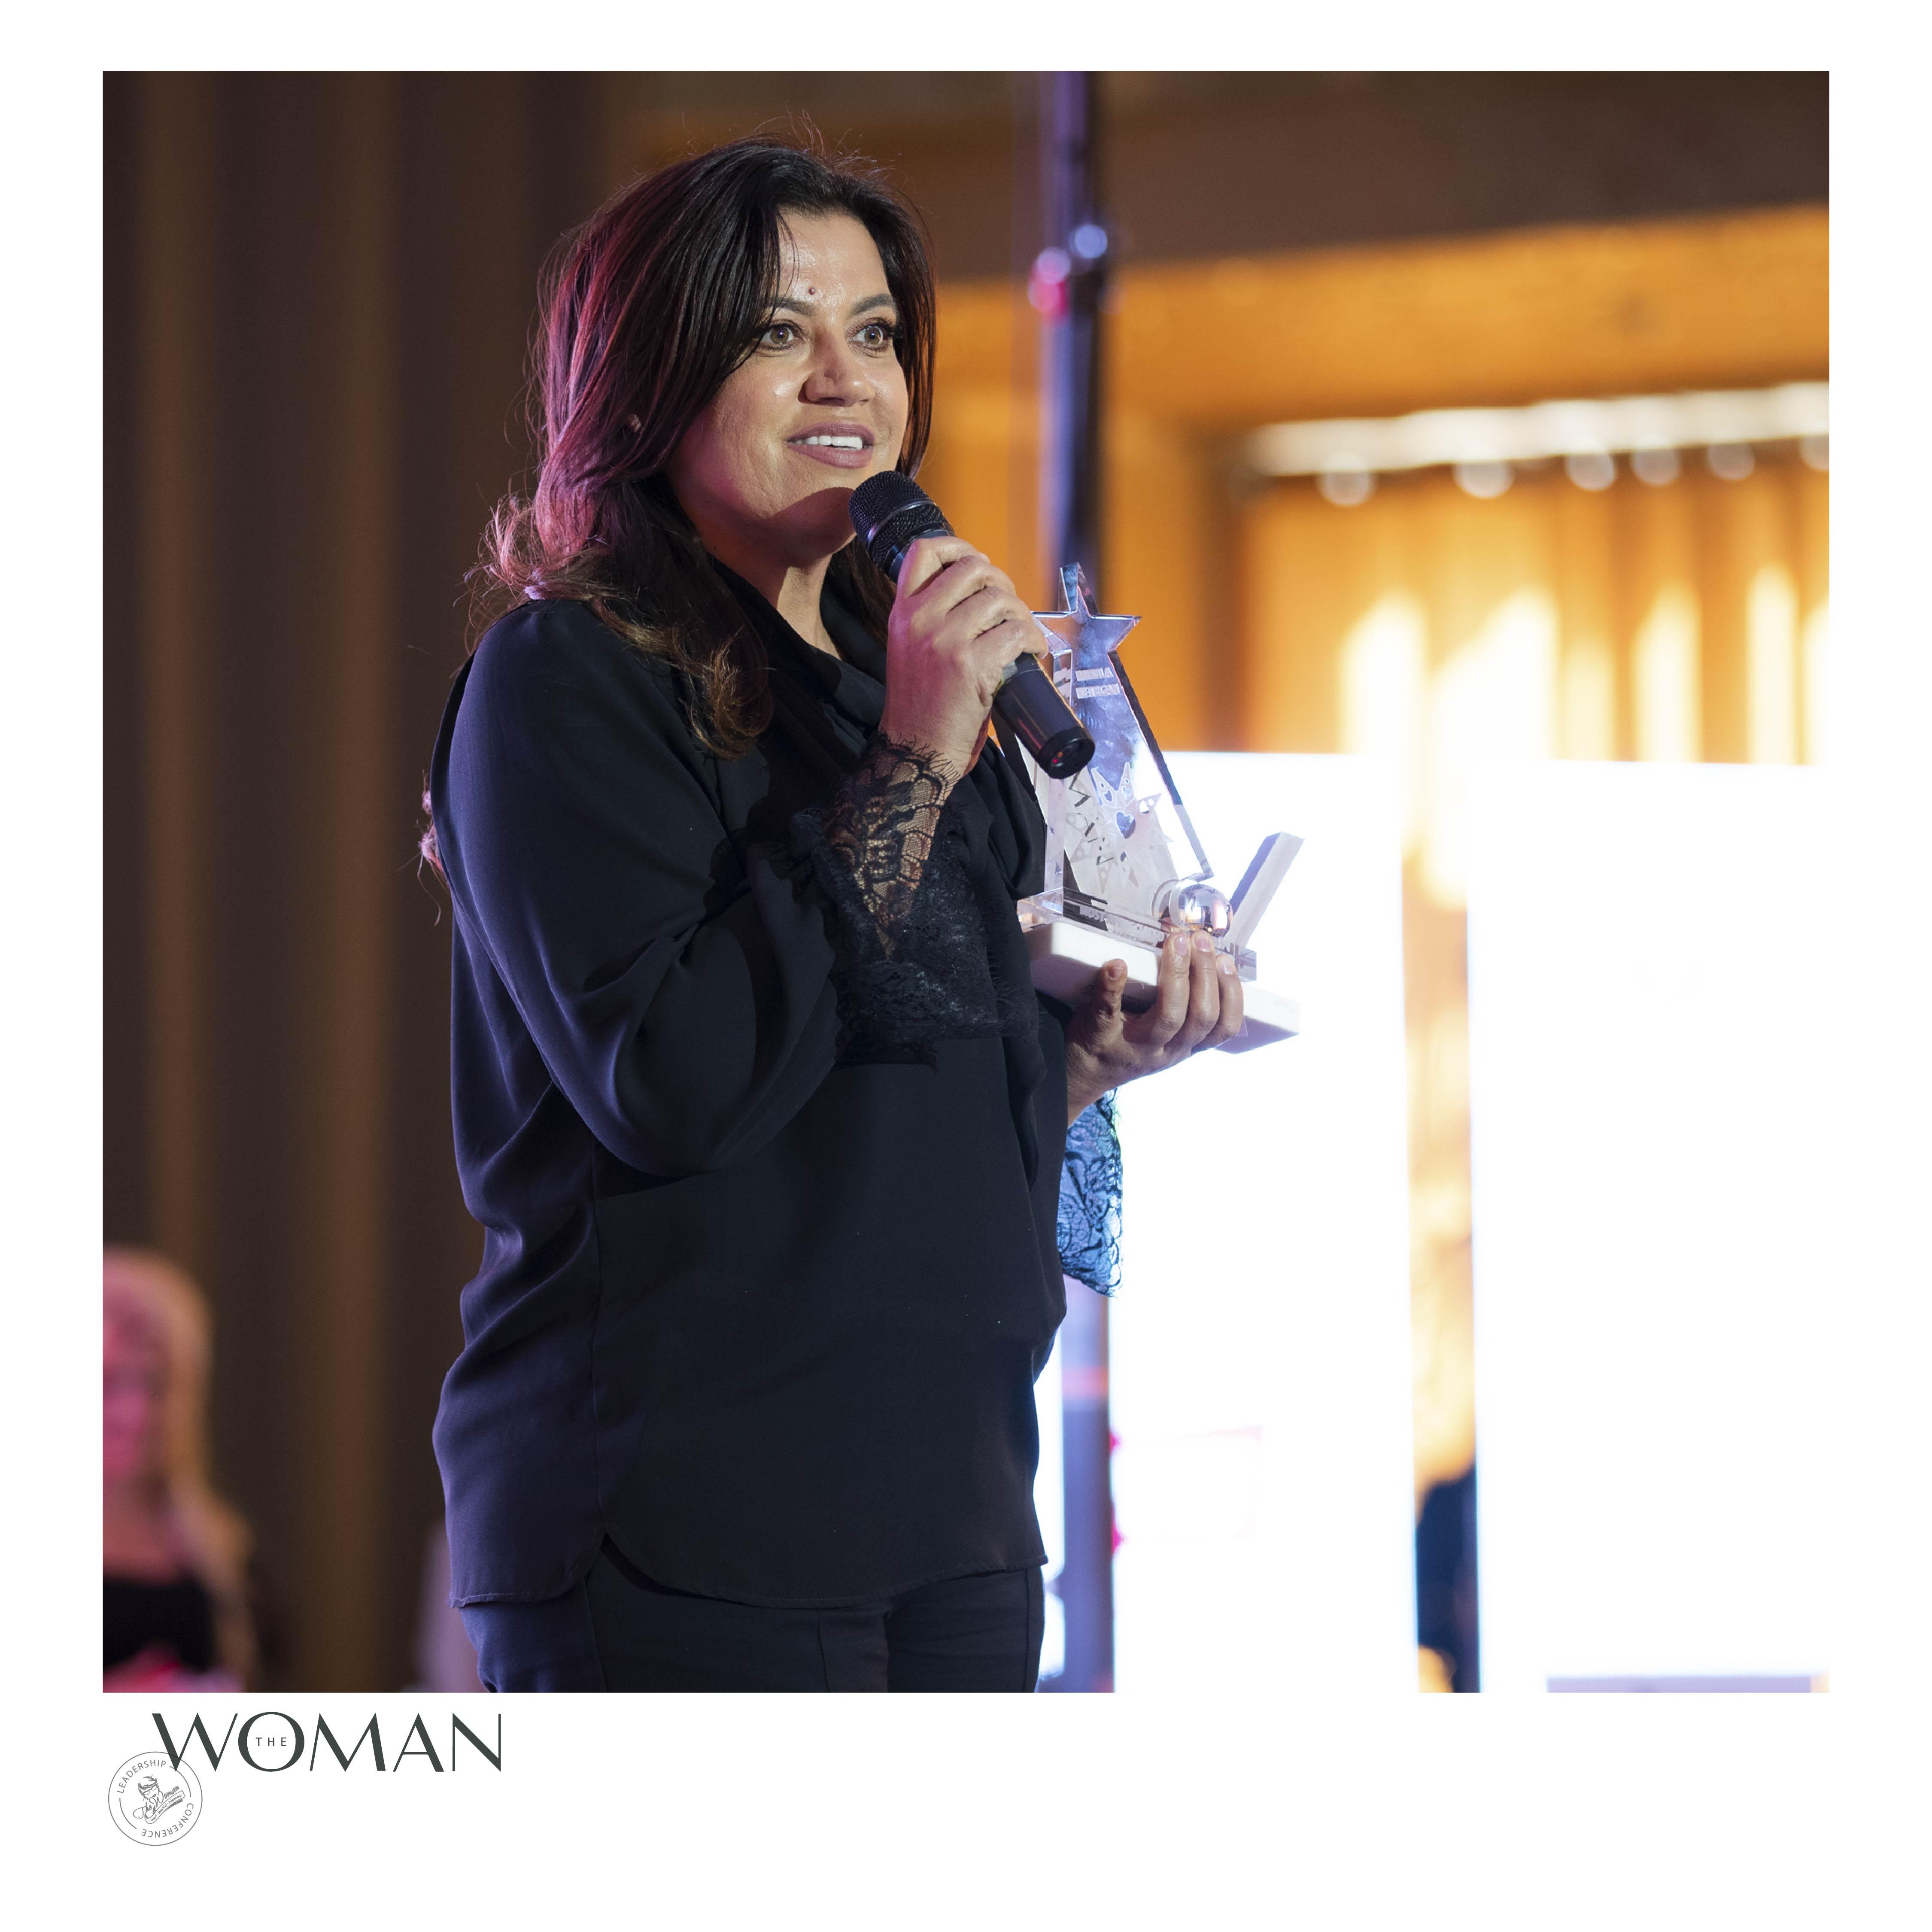 Conferința de leadership feminin 2019 (6)